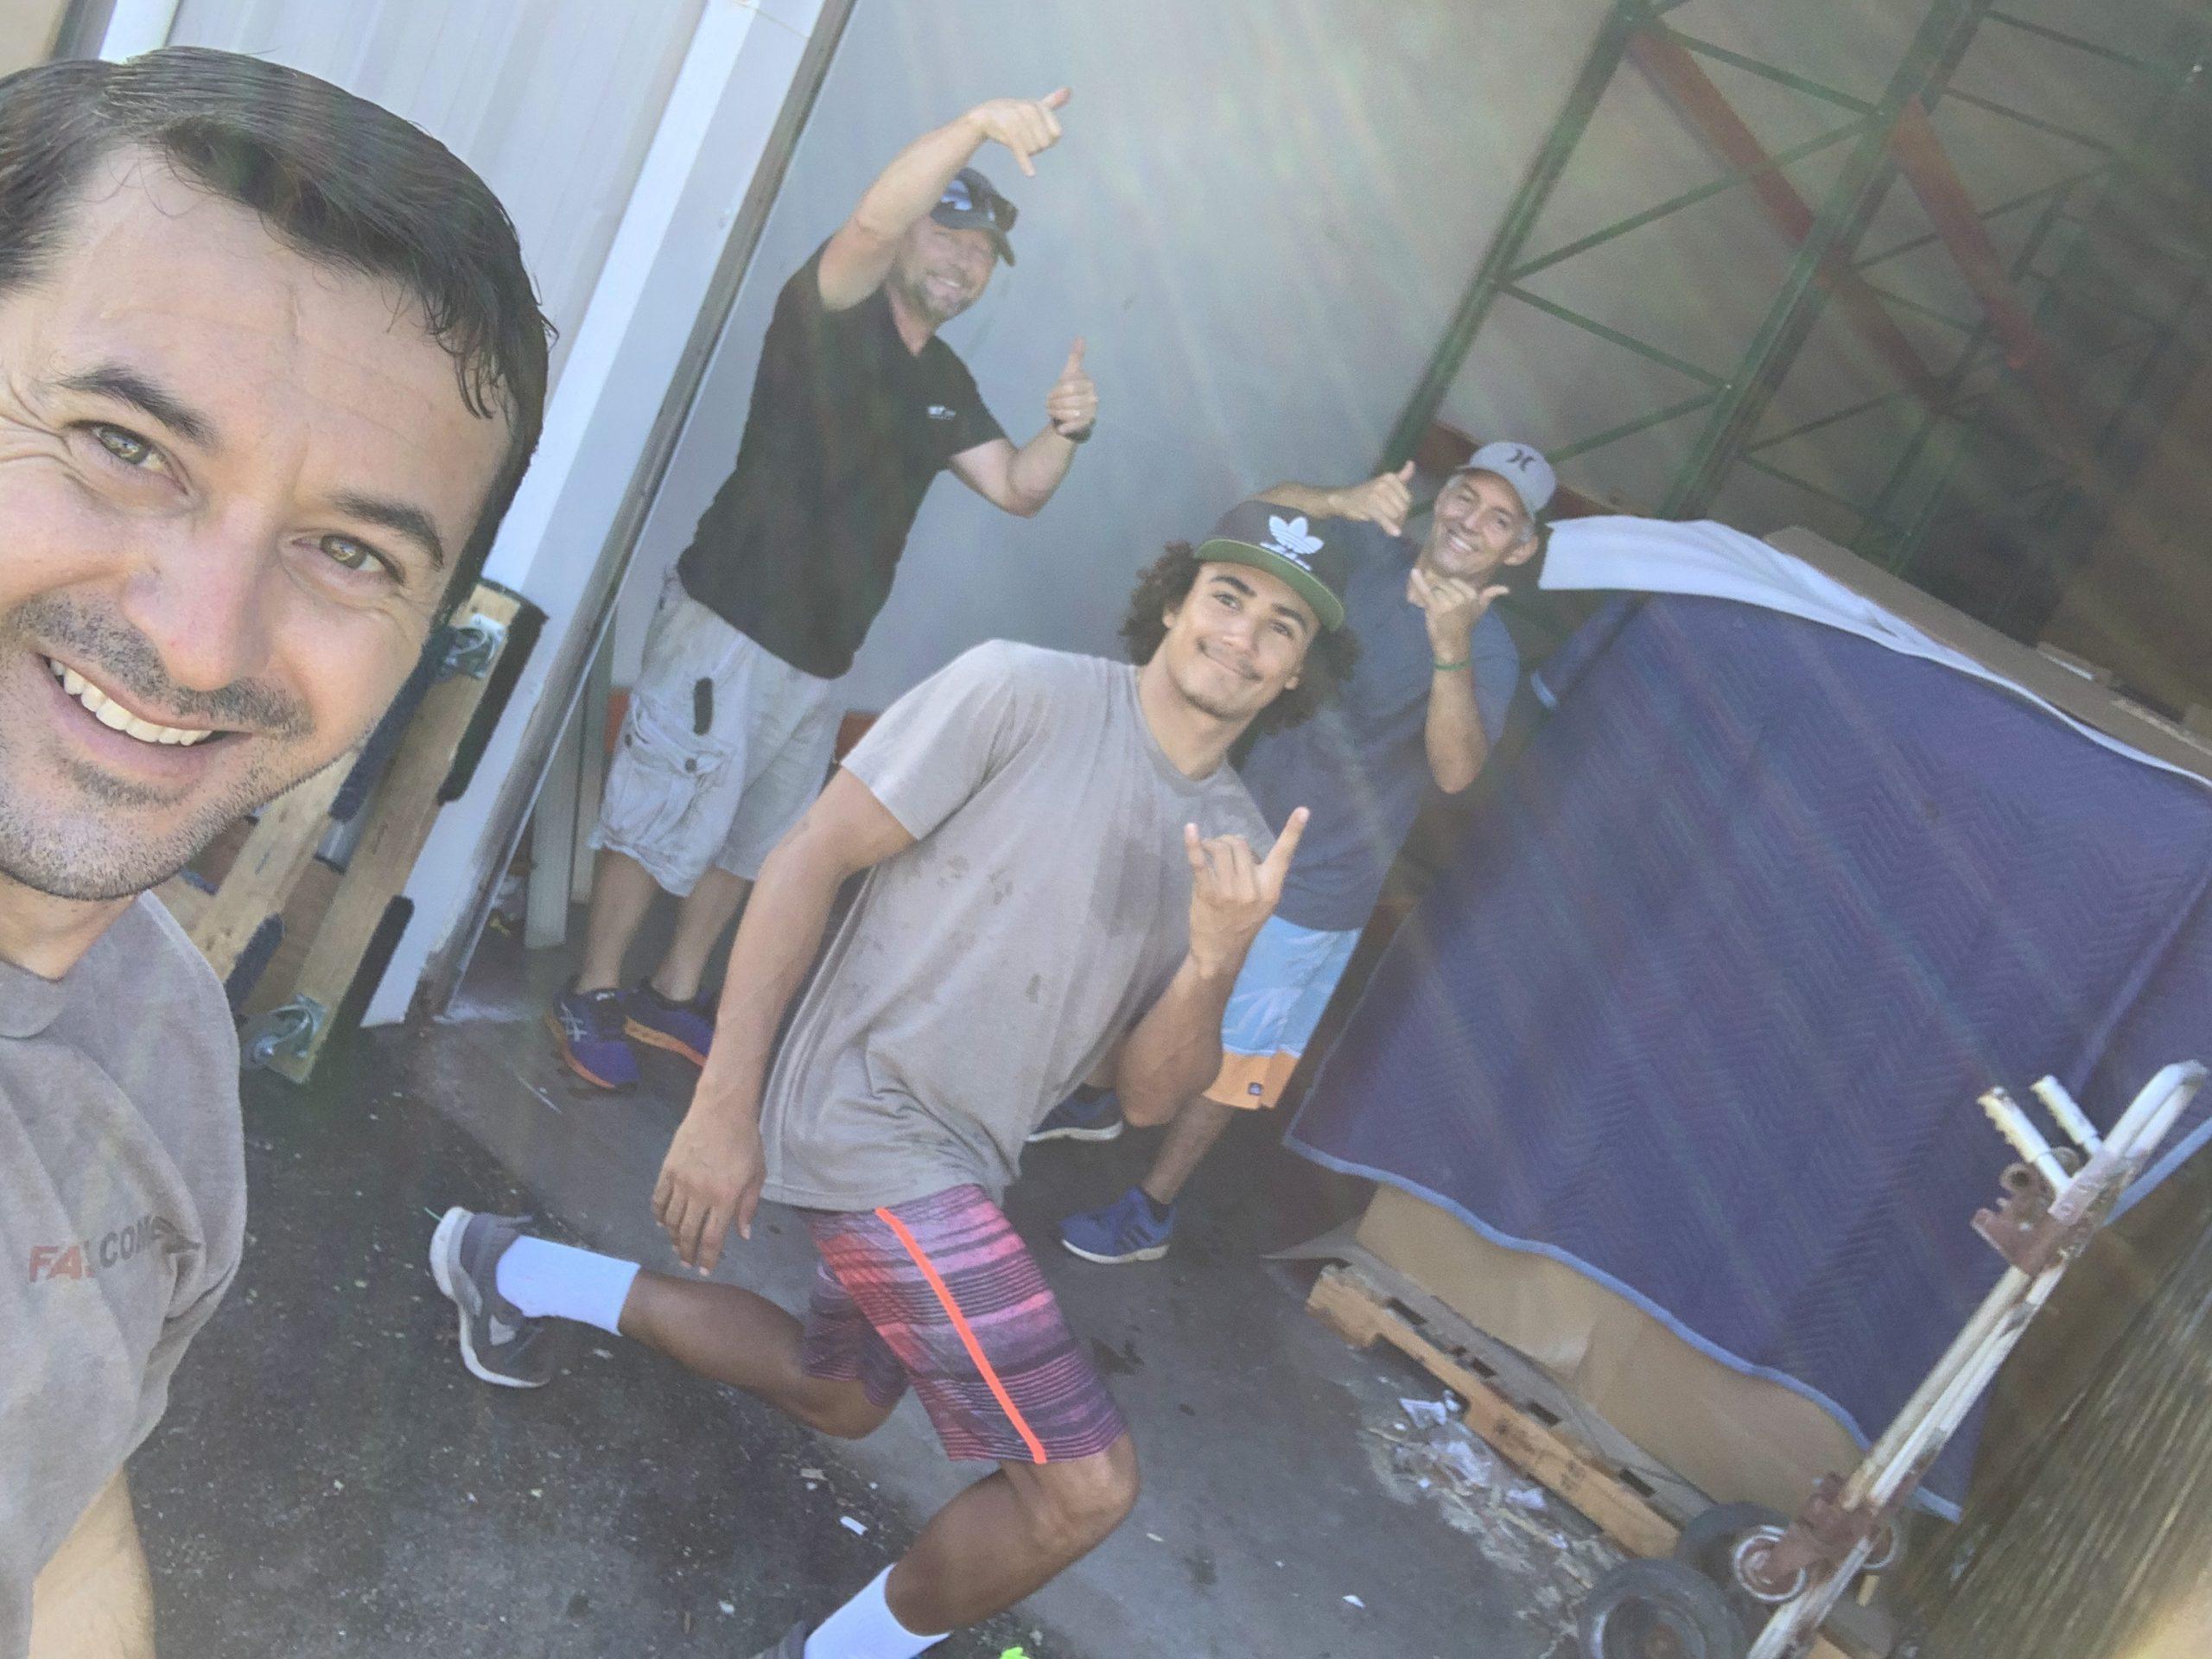 Fast Comet Warehouse 8 - Maui Hawaii - Movers